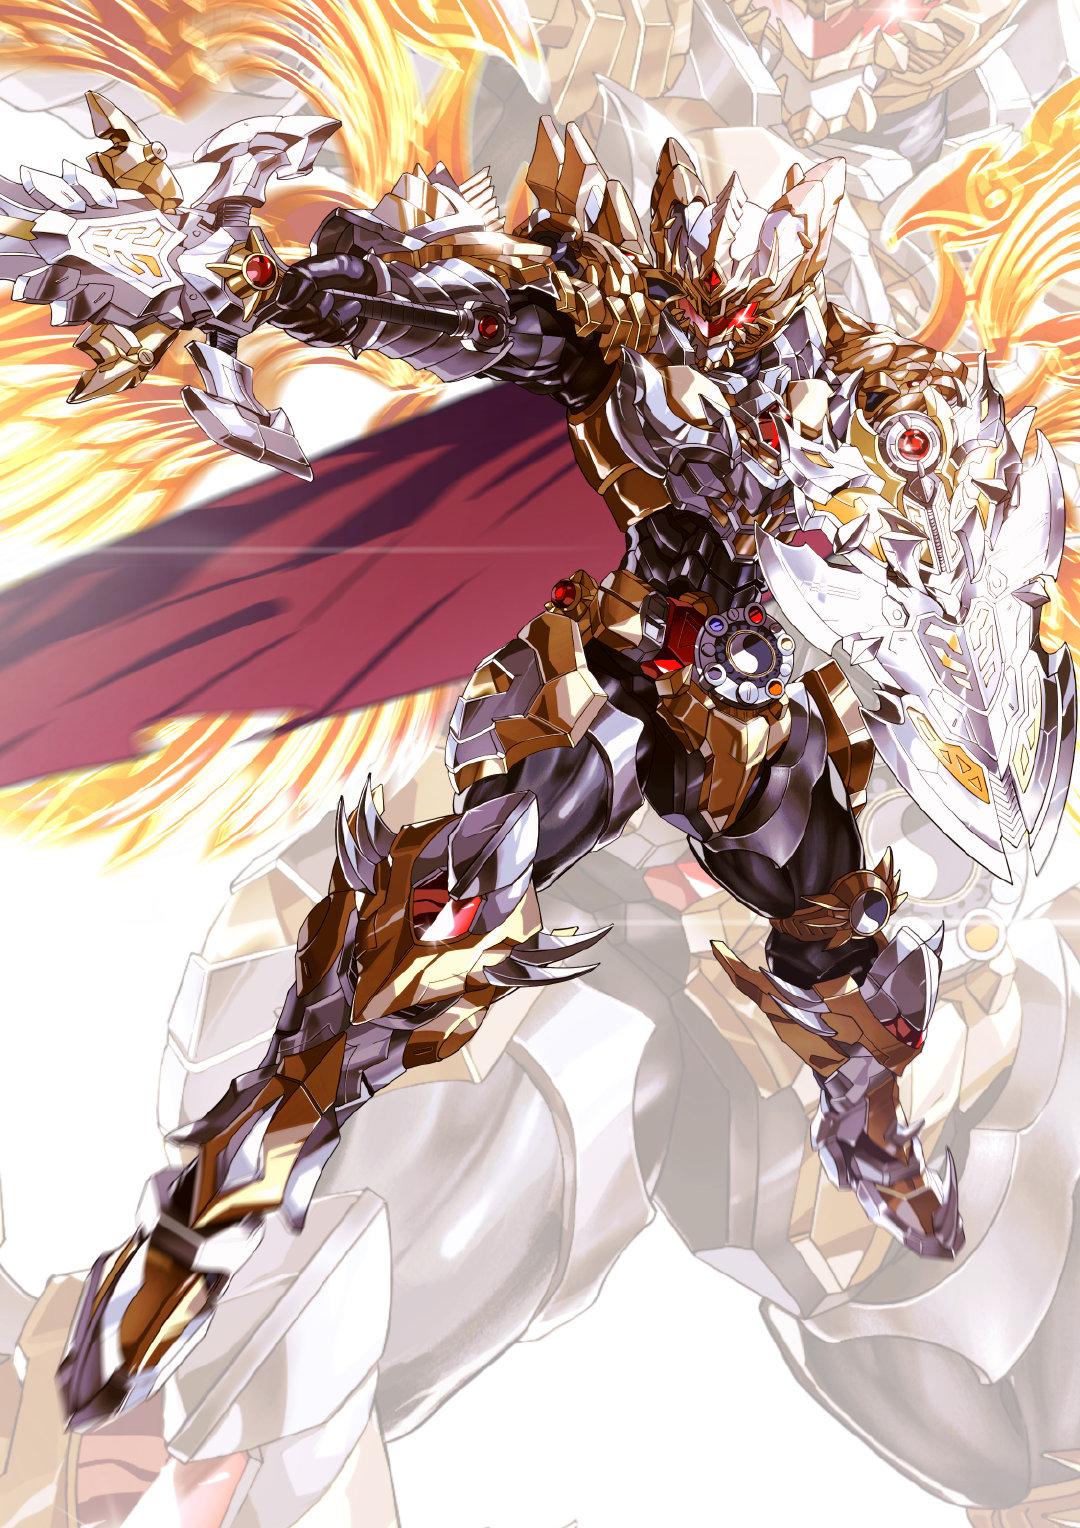 S535_Armor_hero_Emperor_024.jpg